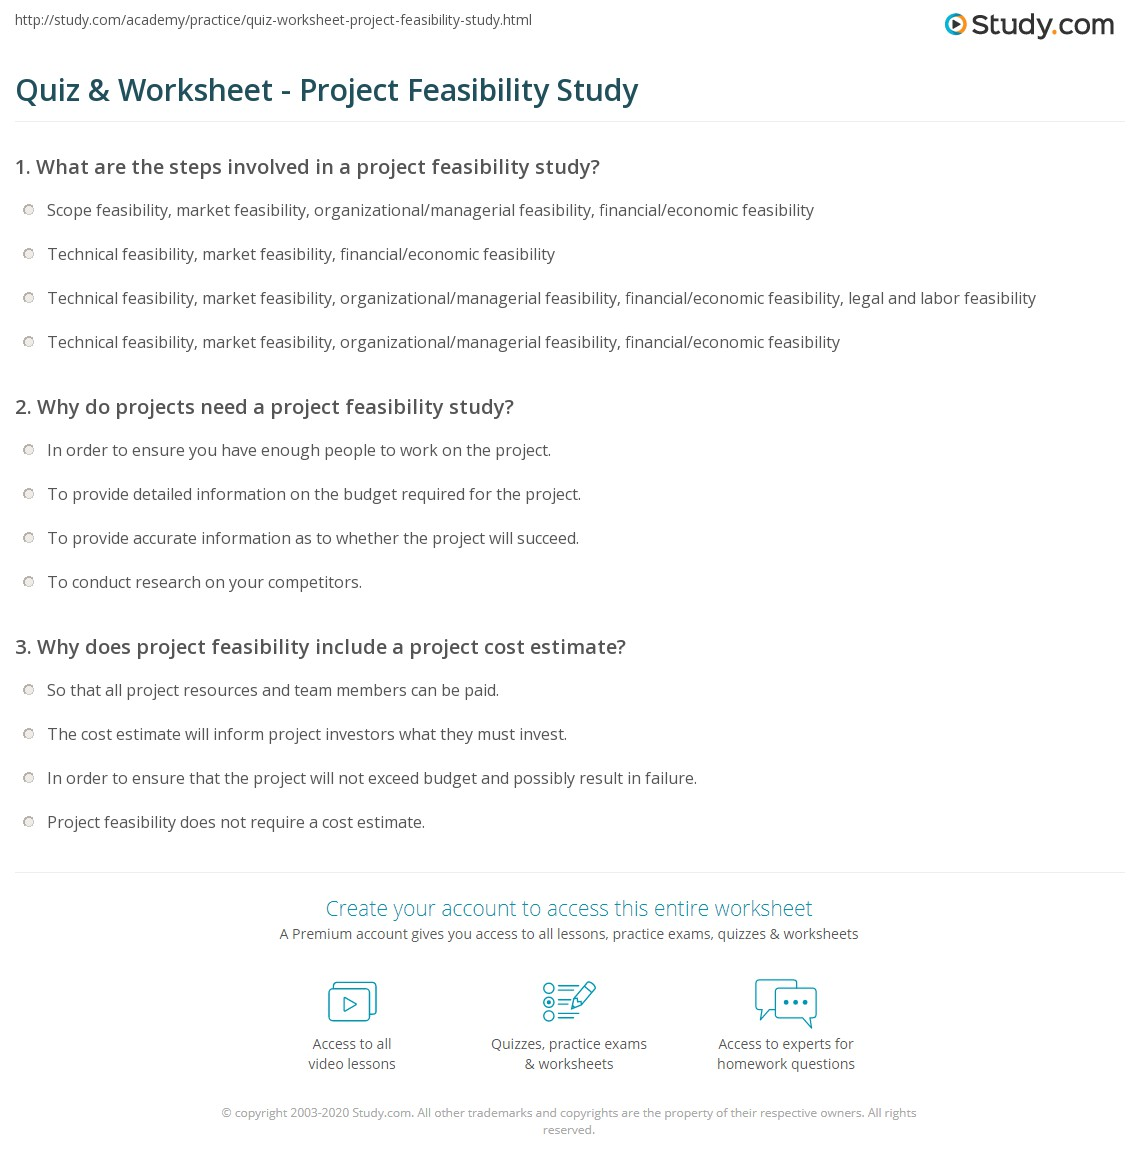 Quiz & Worksheet - Project Feasibility Study | Study.com